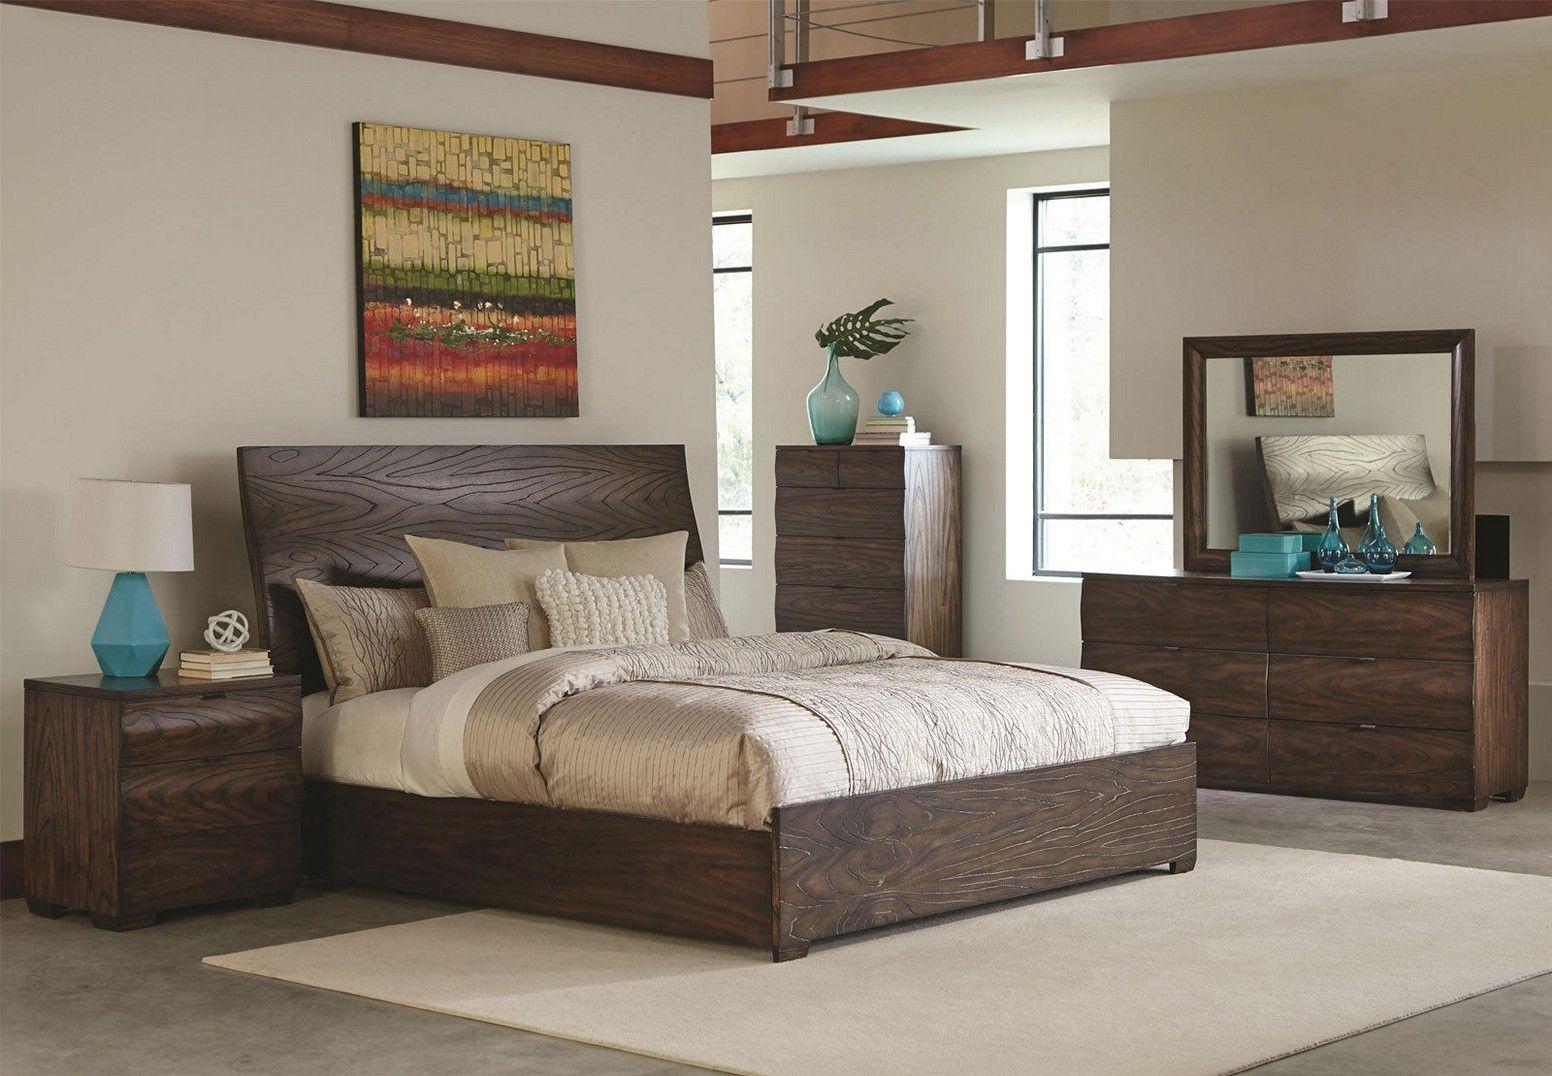 master bedroom idea. Small Master Bedroom Ideas Big For Room Decorating Furniture Idea C